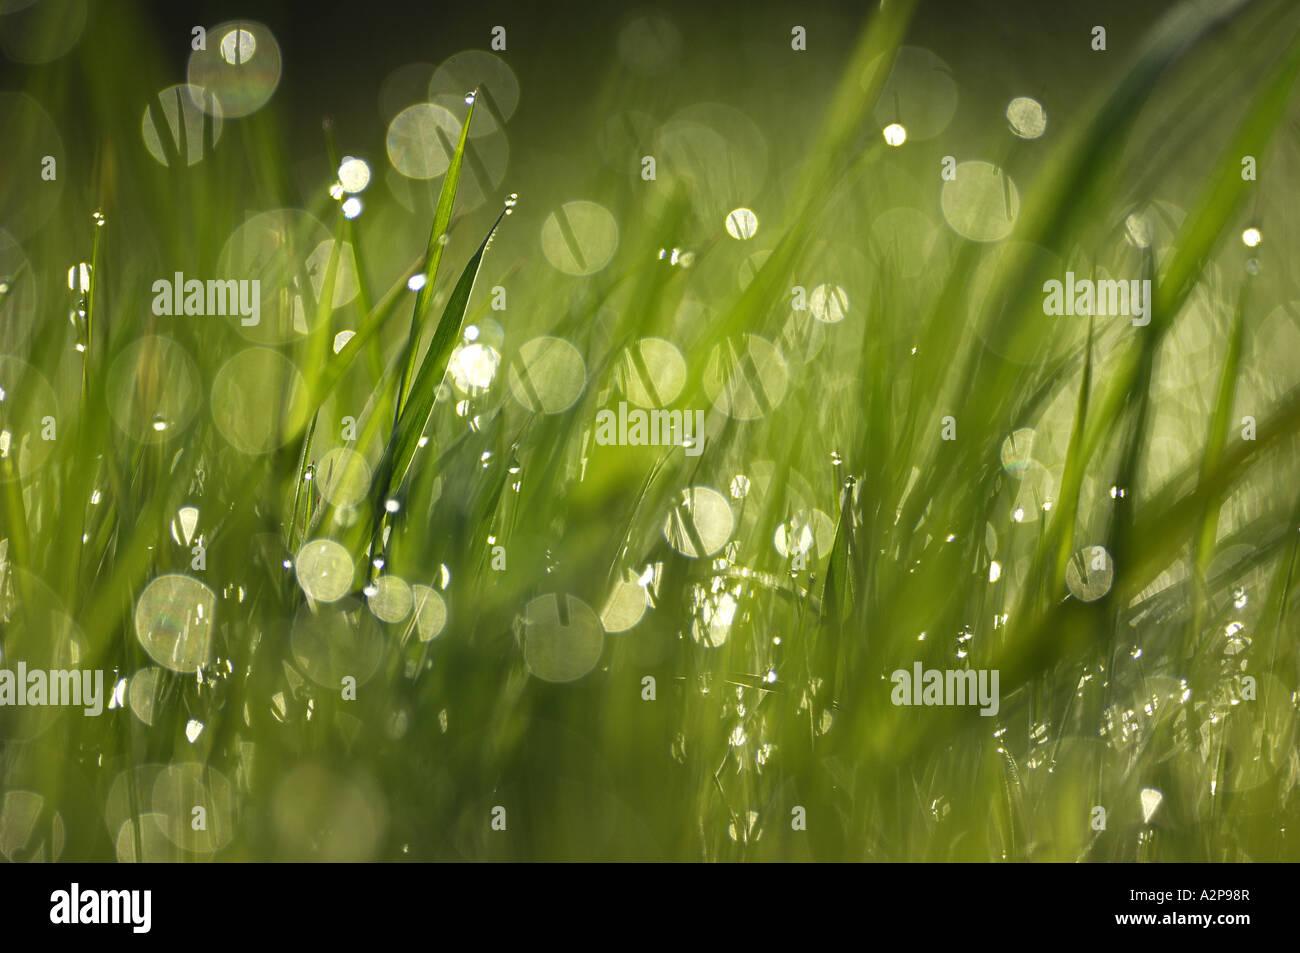 Tautropfen auf Rasen Stockbild